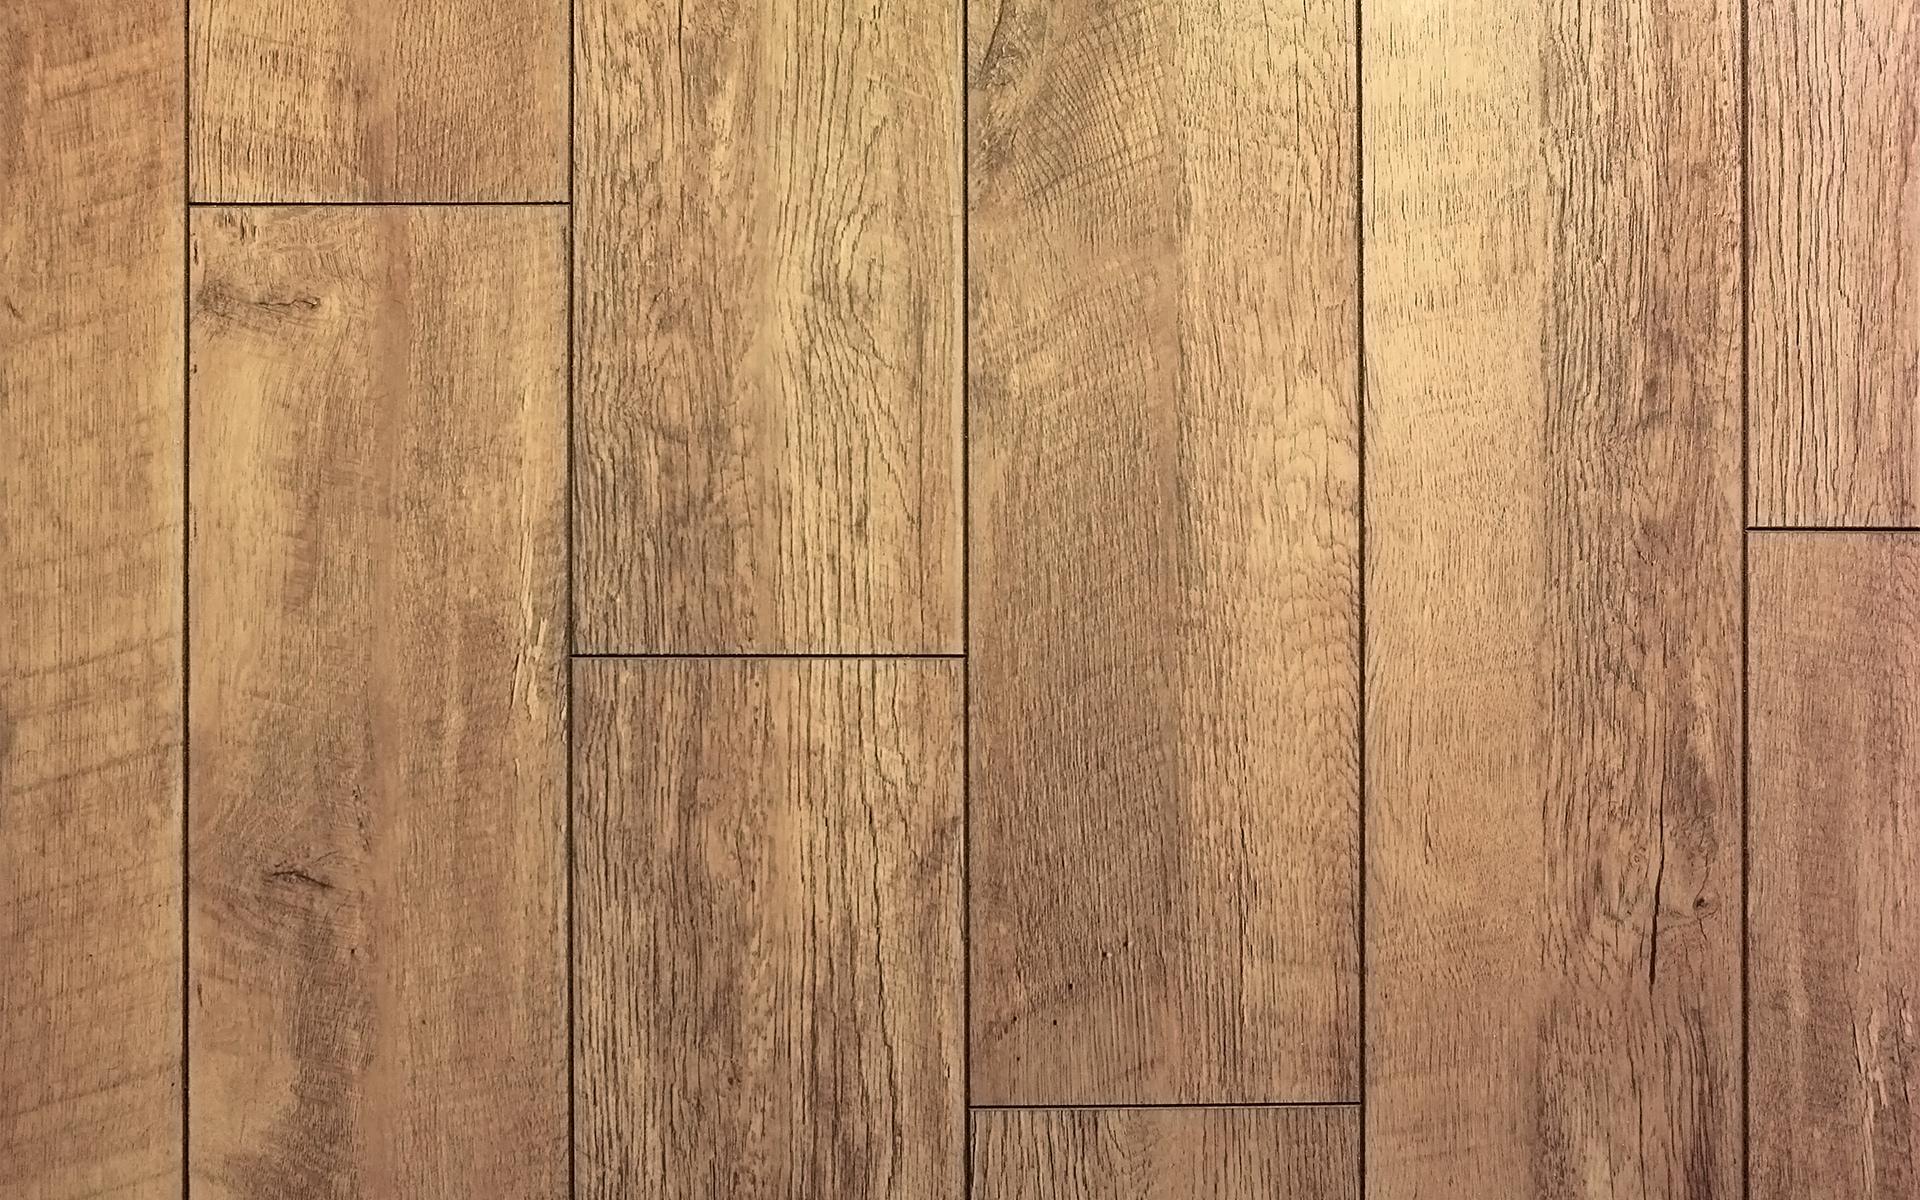 Vers De Bois Parquet - Wood pattern texture wallpaper 1920×1200 50218 WallpaperUP